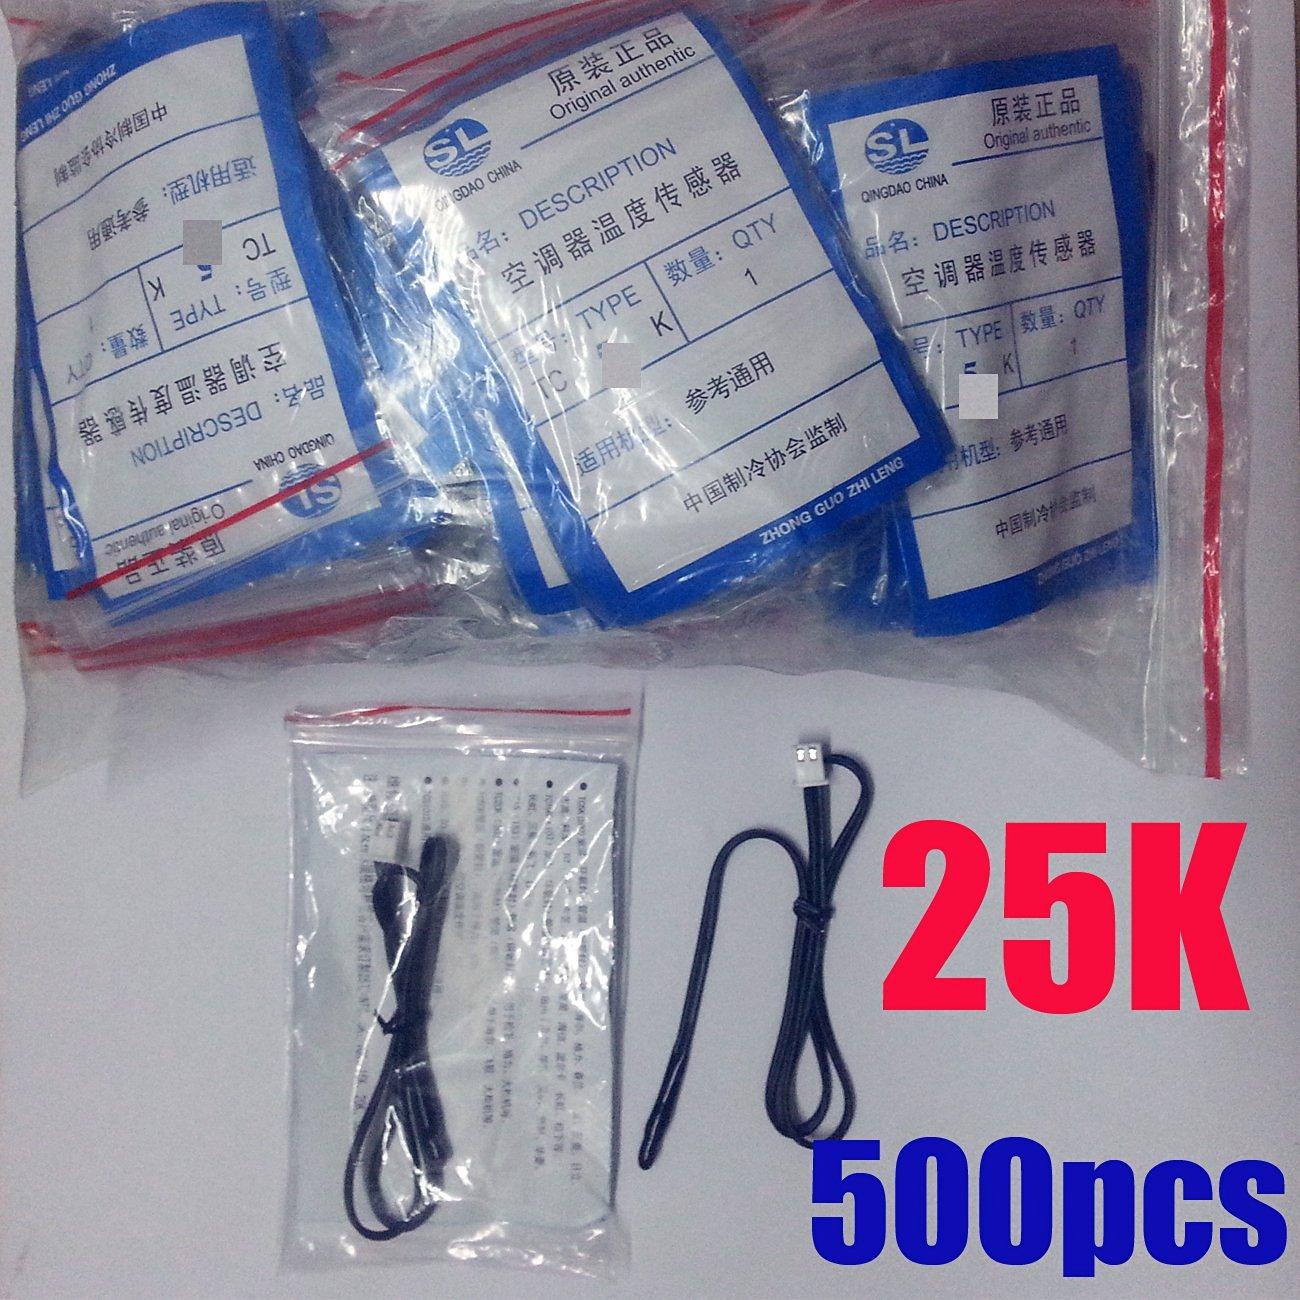 Buy 500Pcs 10K Generic Replacement Window Wall Mount